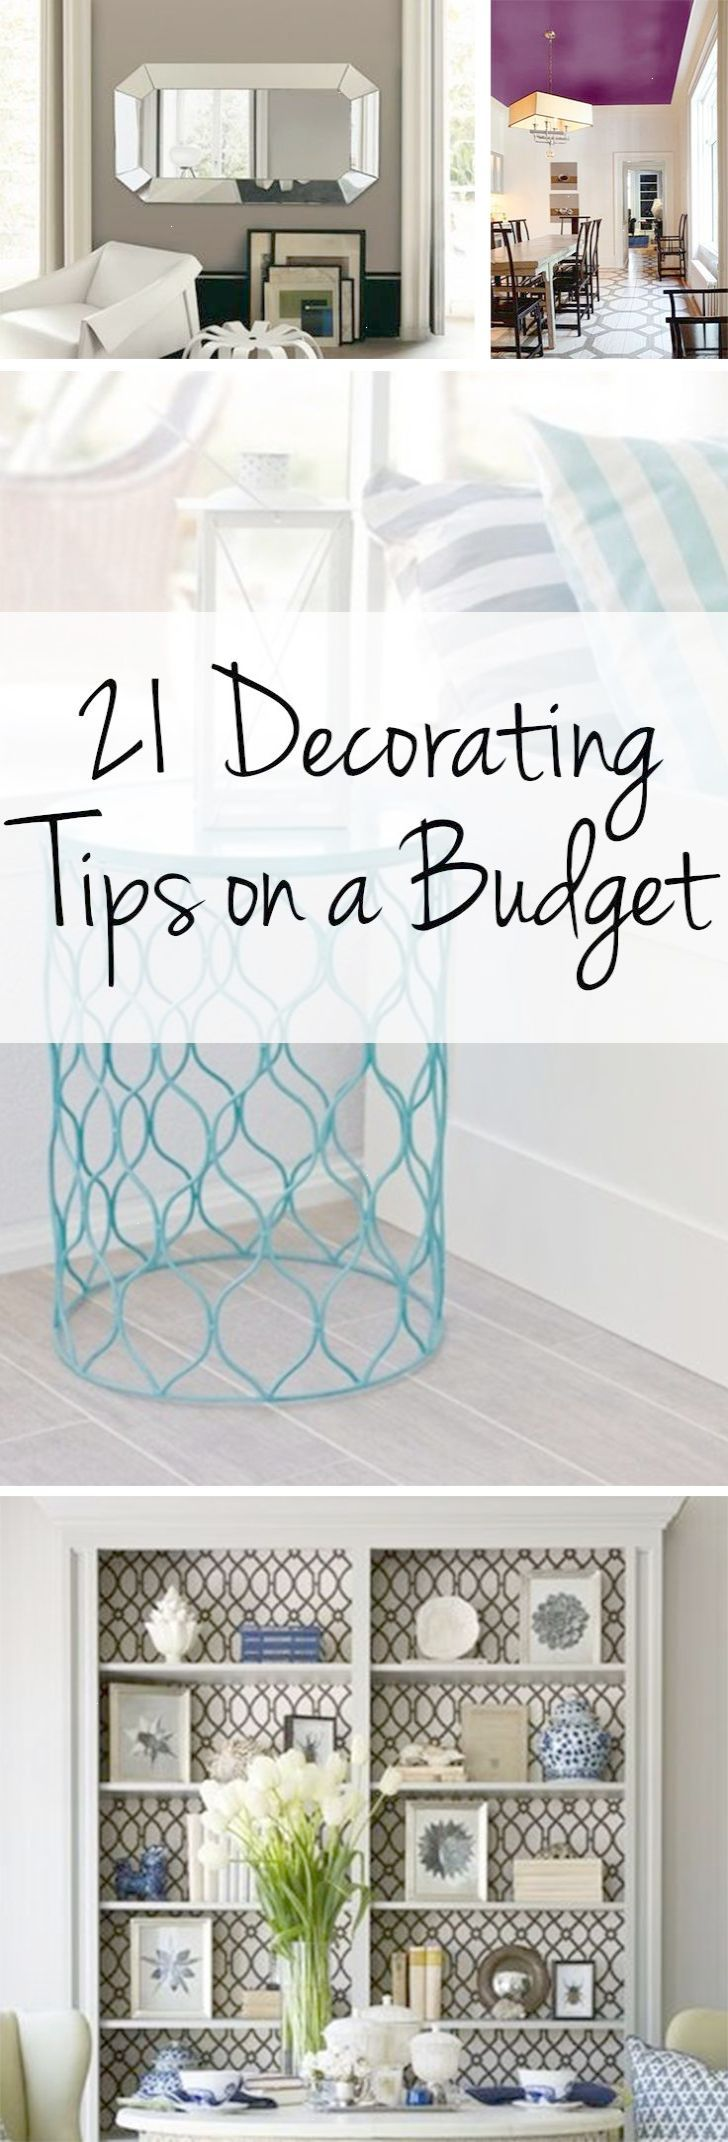 Decorating tips budget decorating frugal home interior design ...